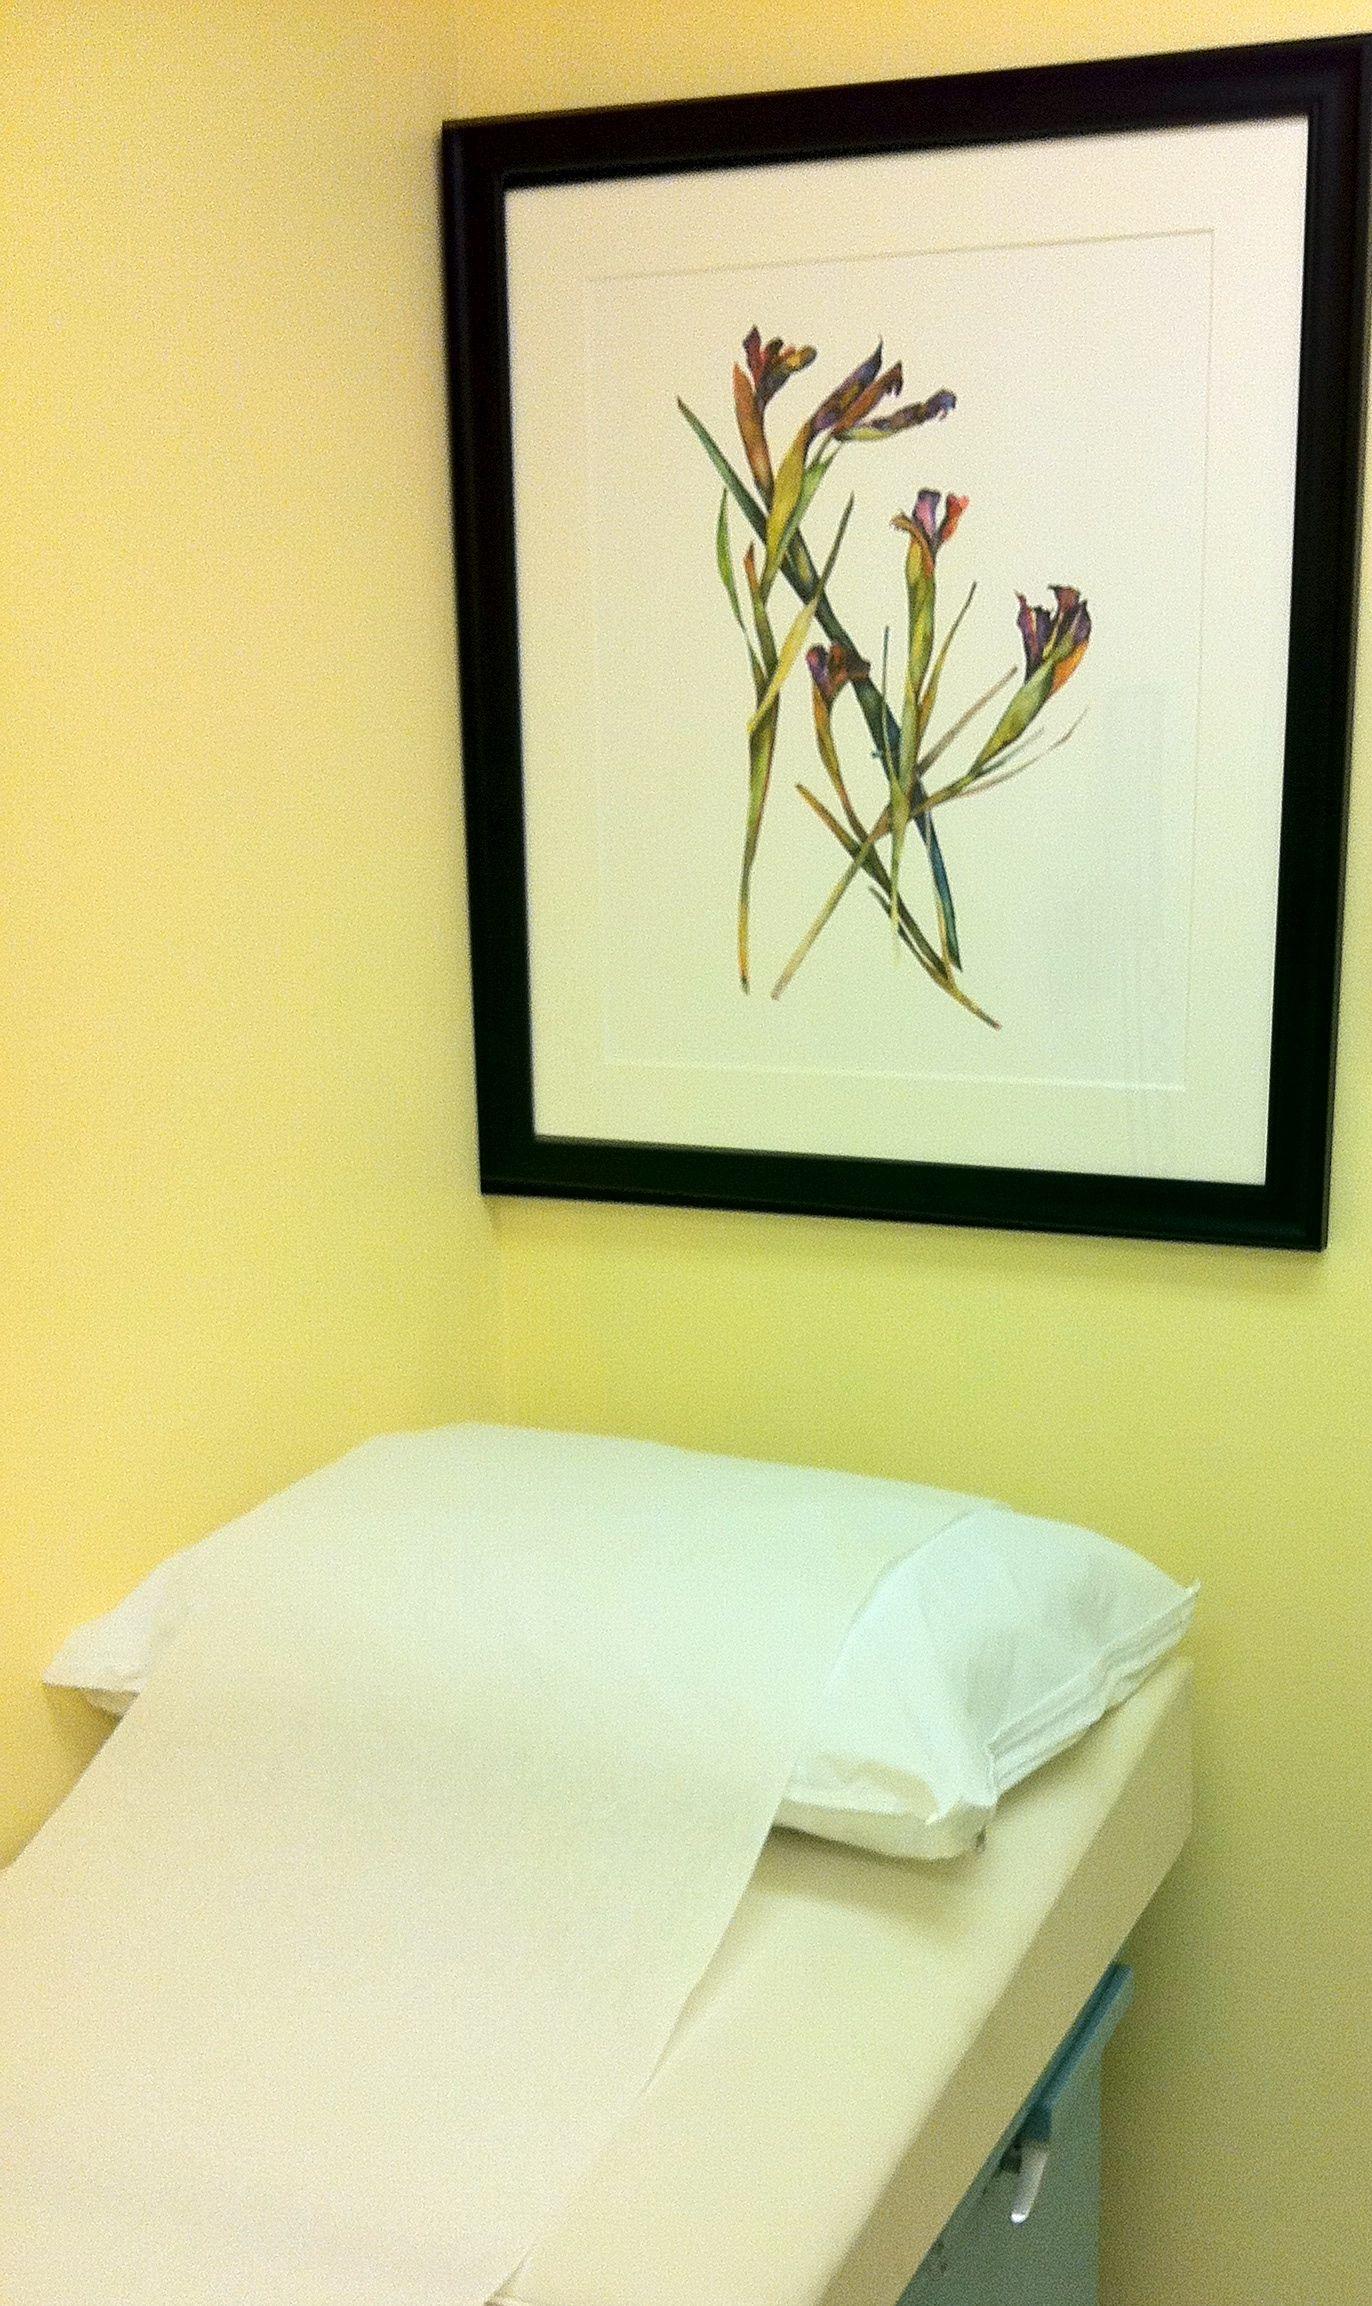 Chemotherapy Room Design: Bontical By Nancy Ballard In The Delores Room, Jennifer